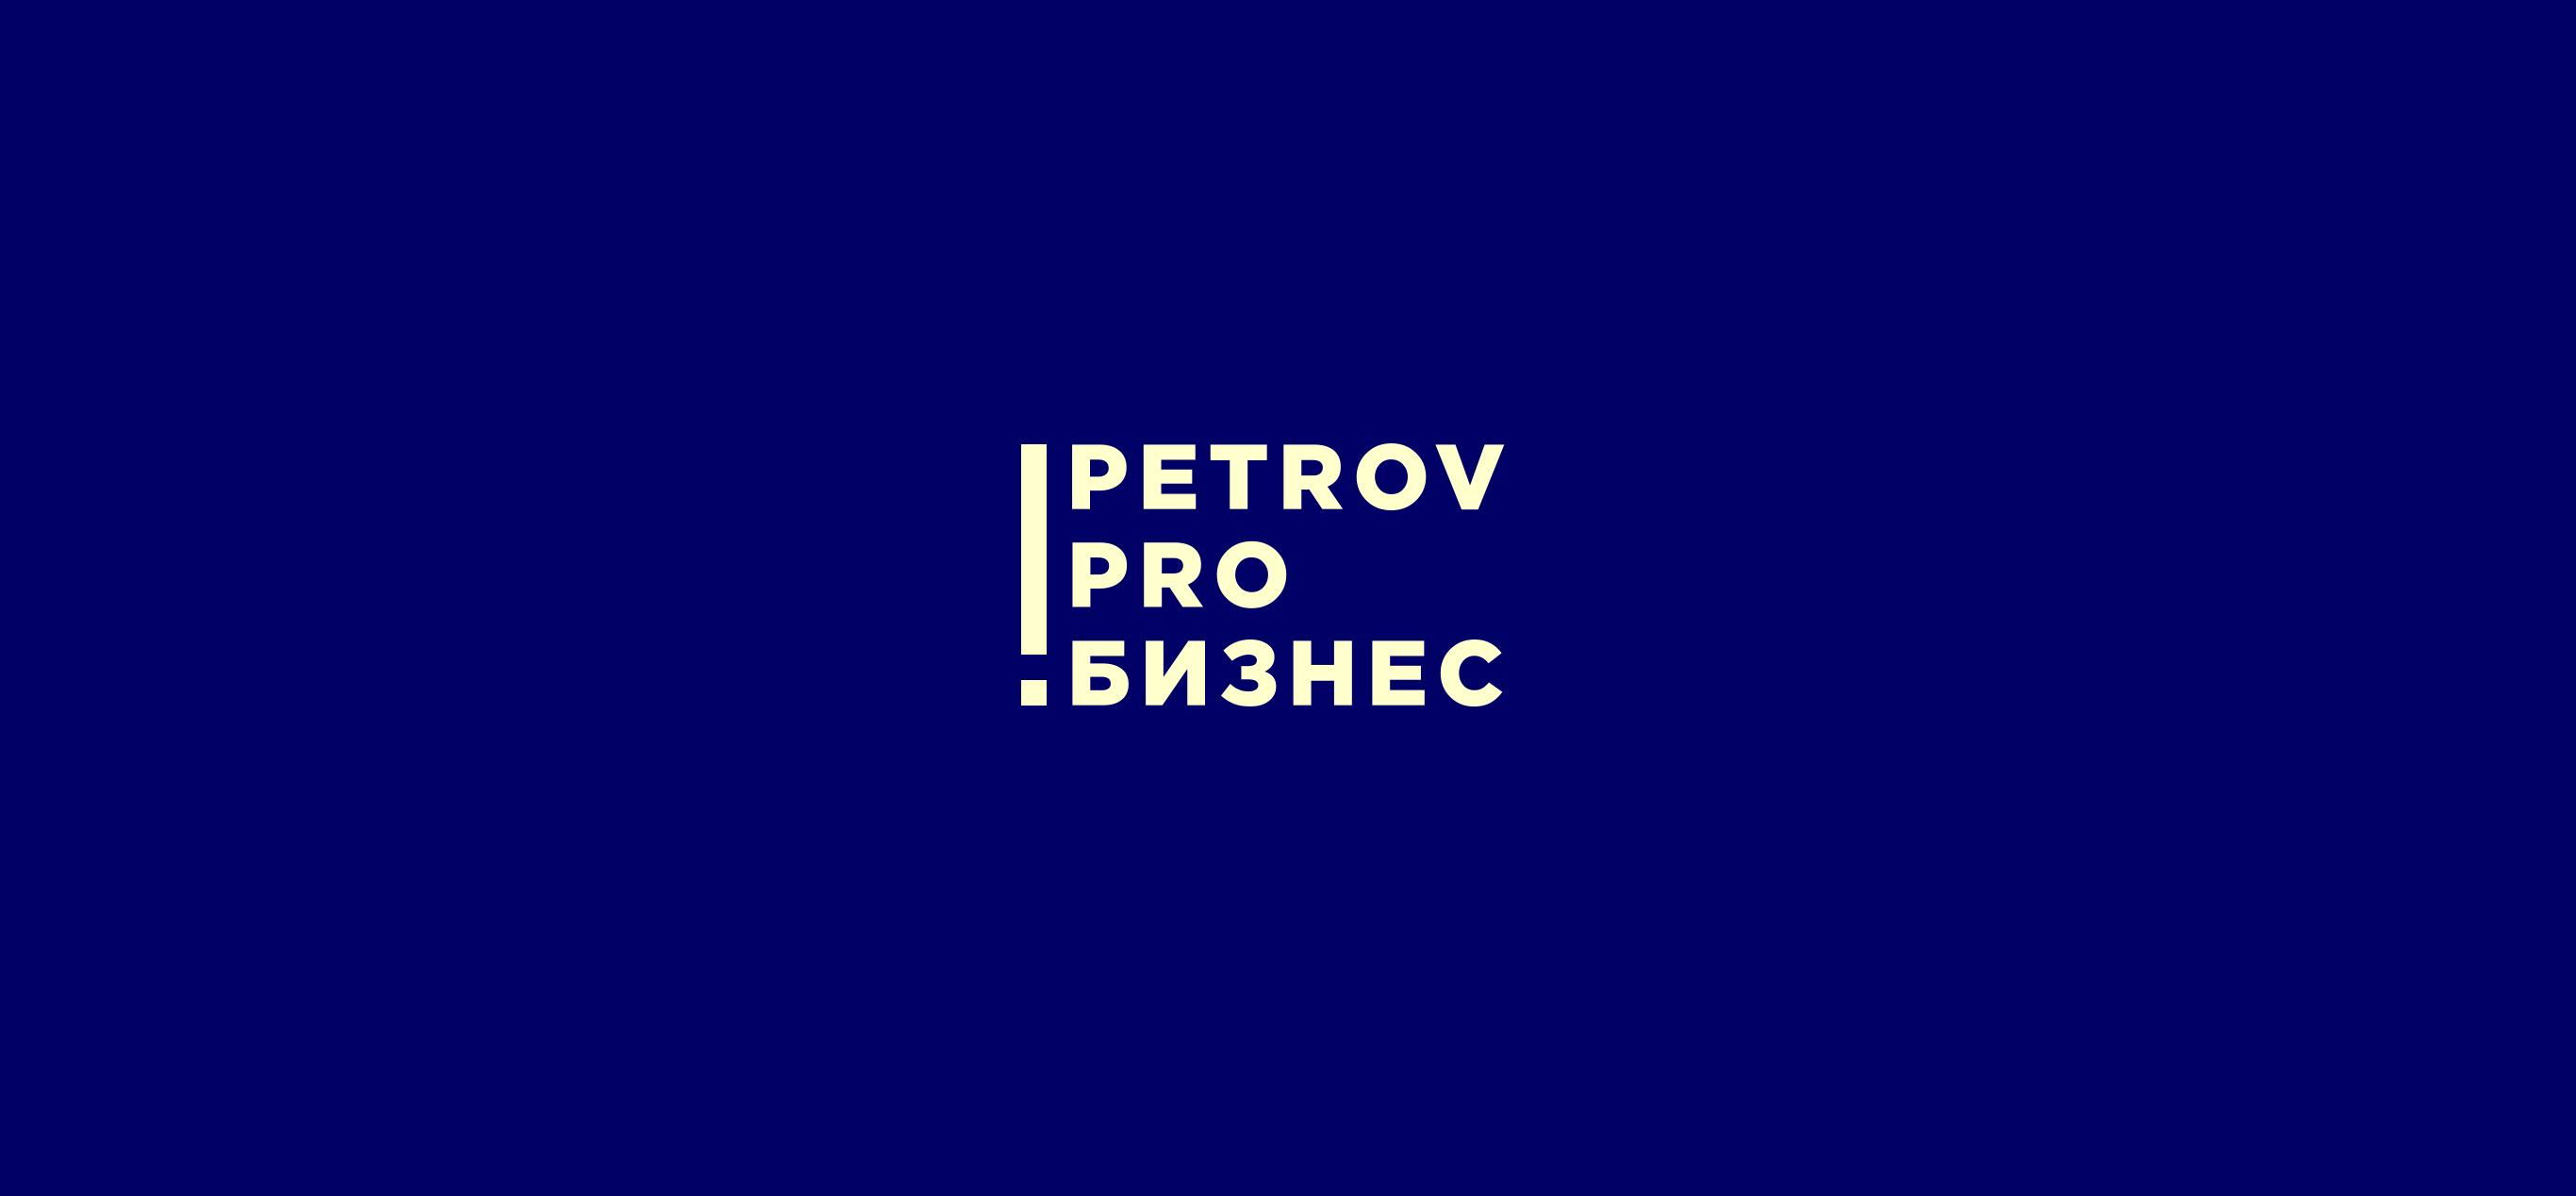 Создать логотип для YouTube канала  фото f_9555bfda293ec111.jpg